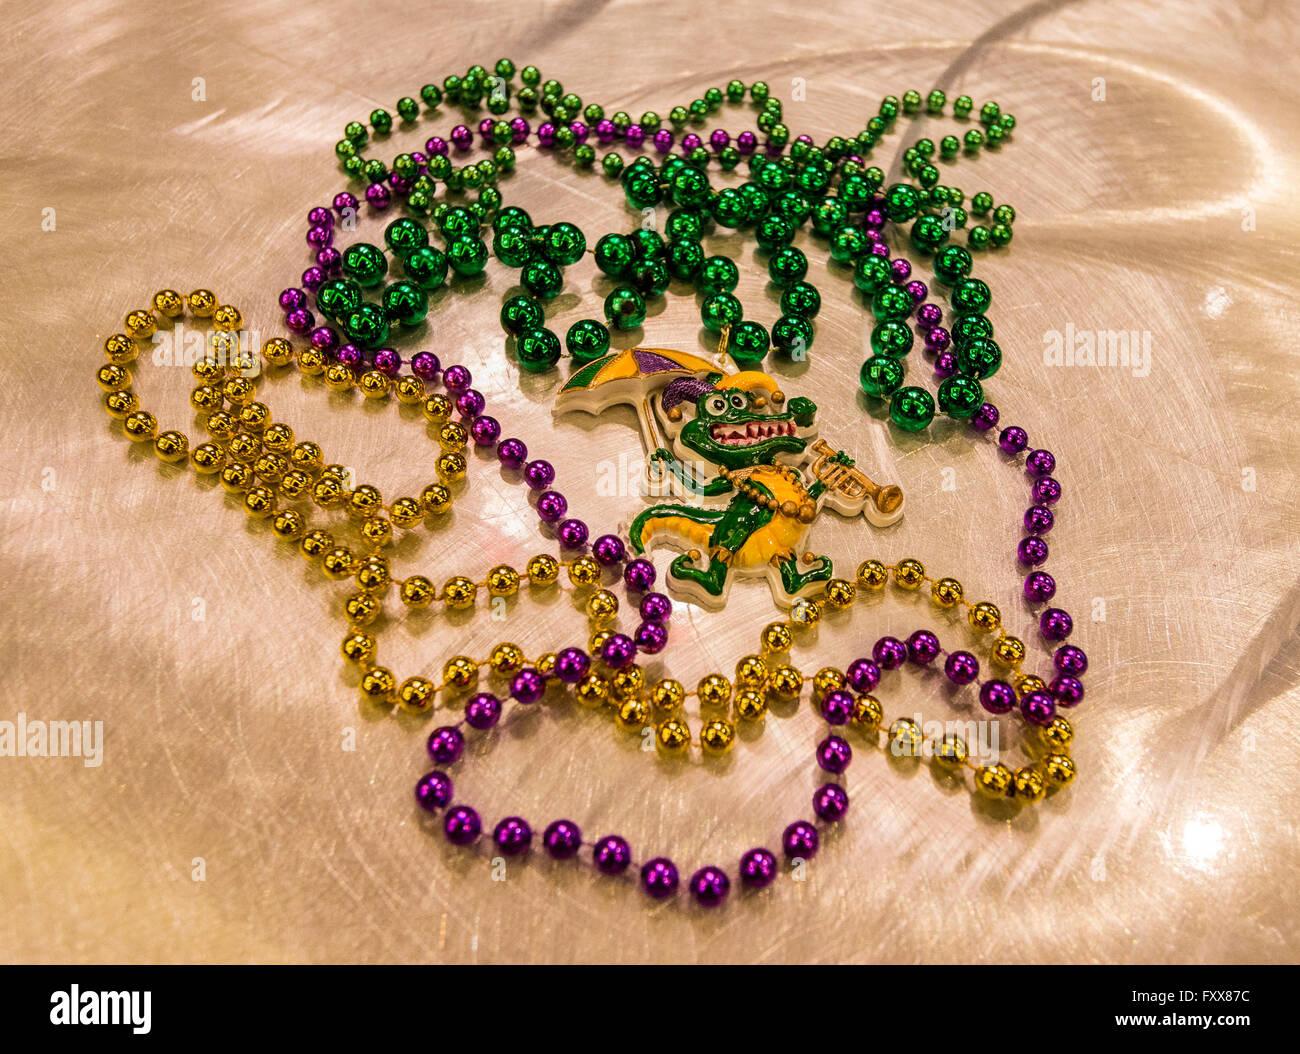 Gumbeaux Gator, the mascot and good will ambassador of Southwest Louisiana - Stock Image